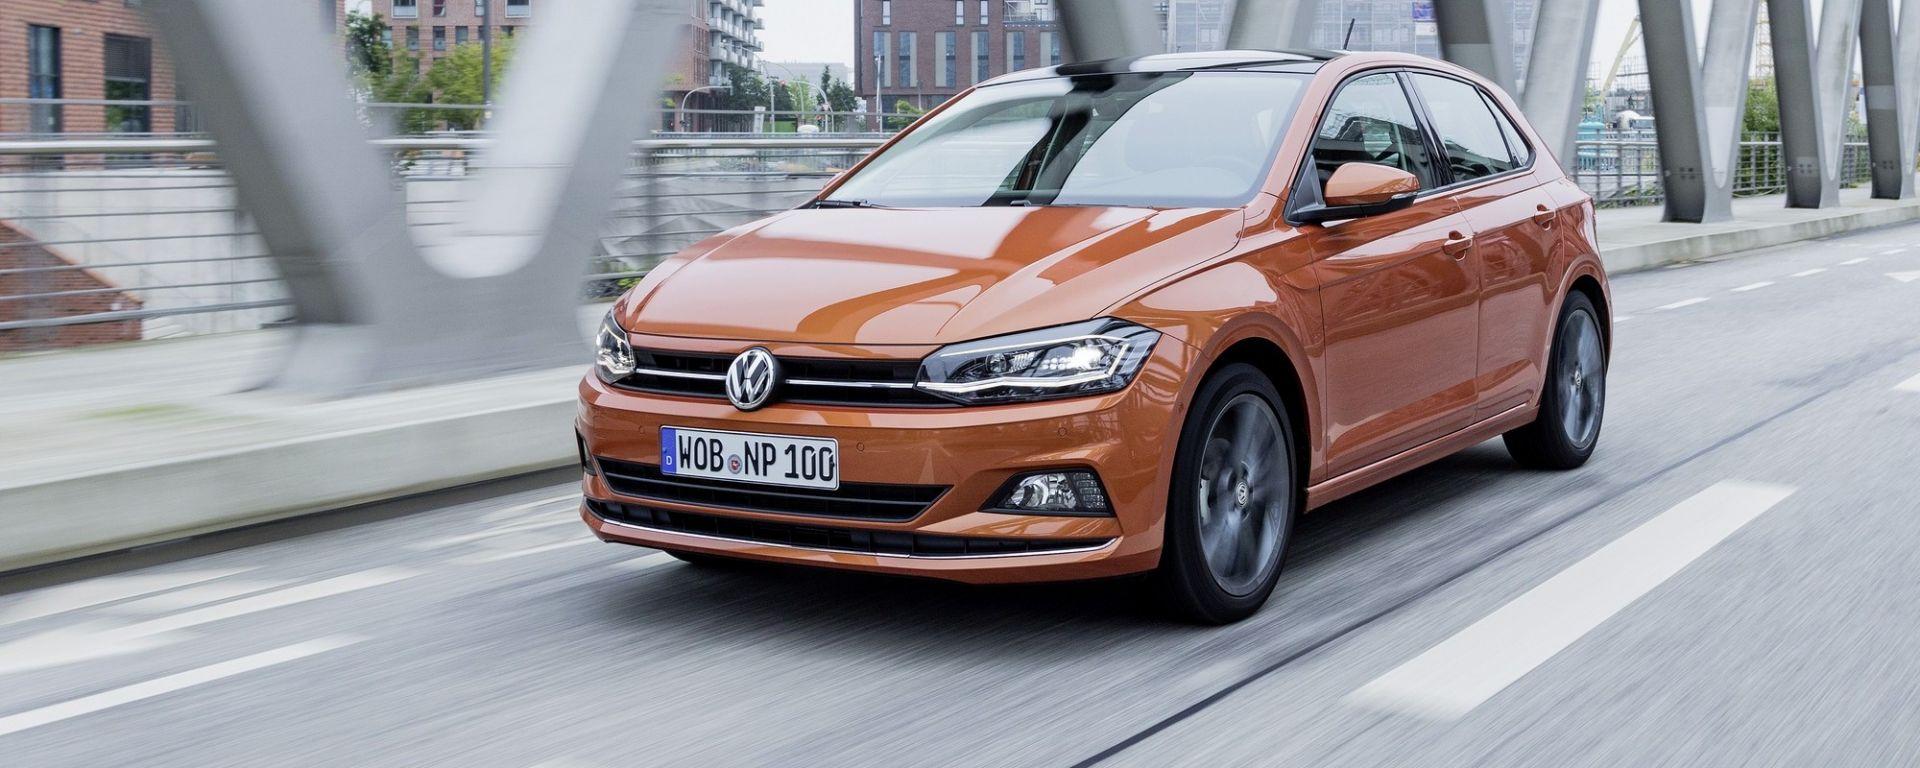 Nuova Volkswagen Polo, la prova